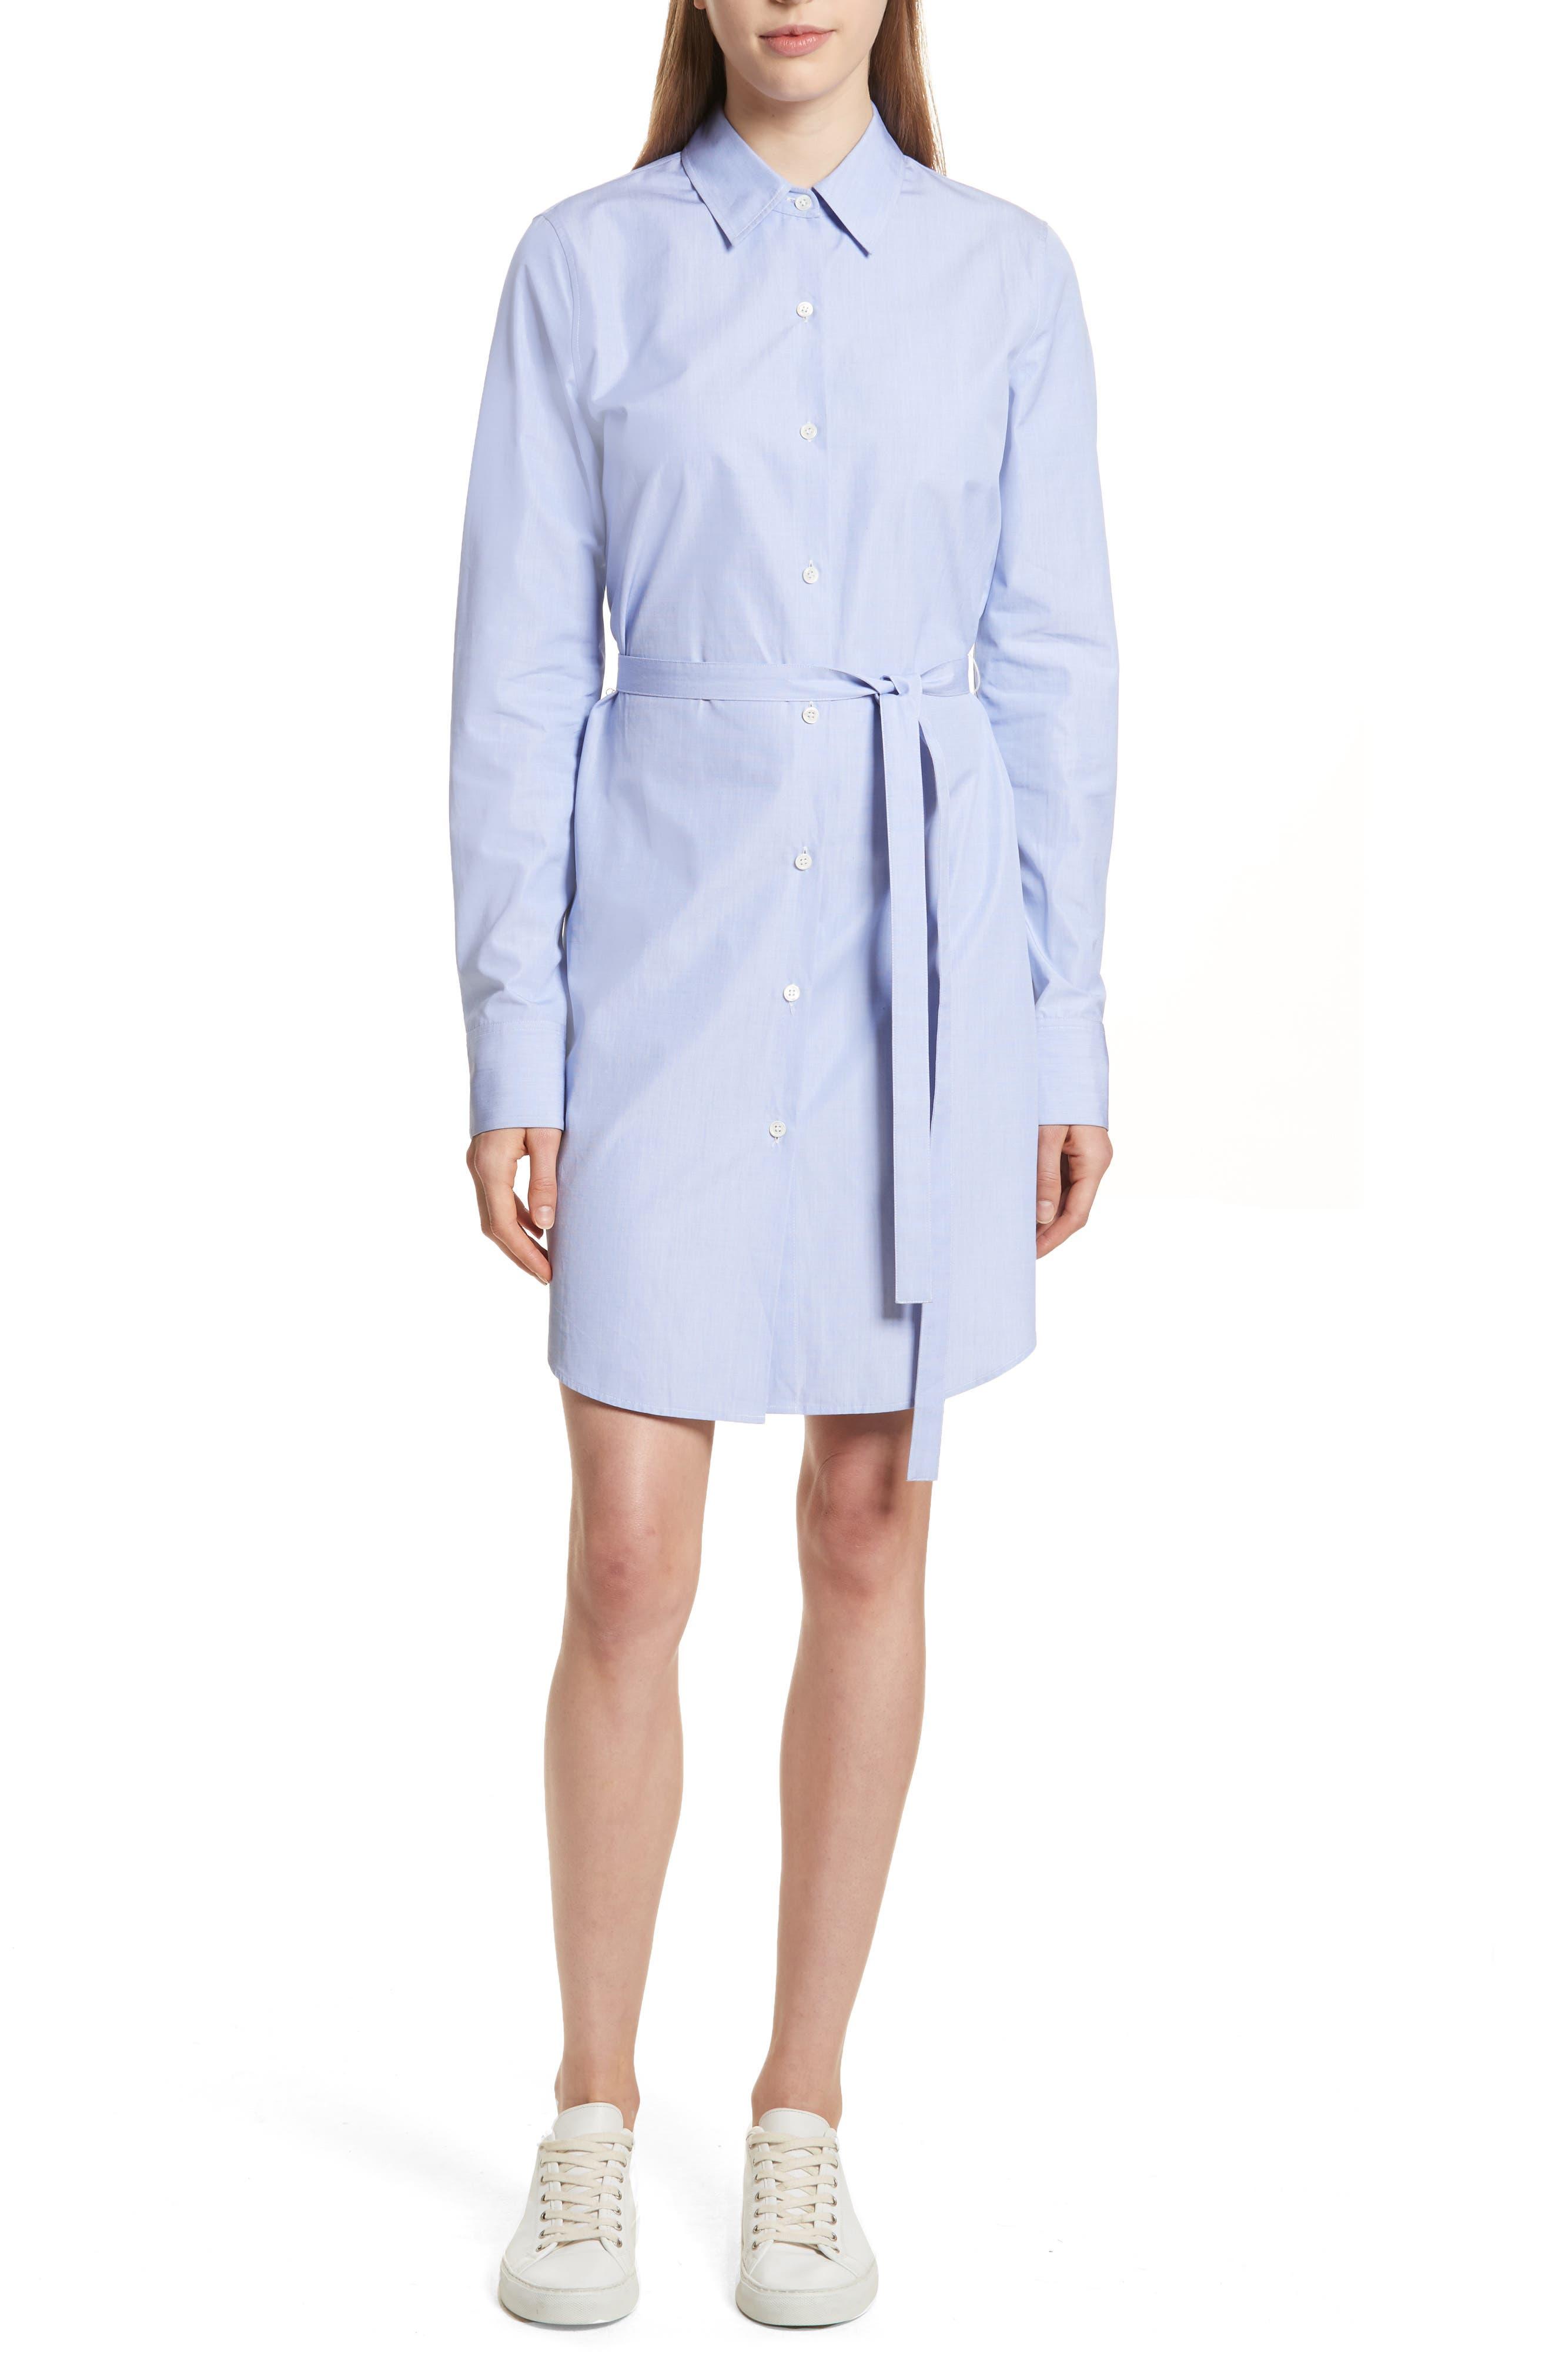 Crowley Cotton Shirtdress,                         Main,                         color, Navy Multi